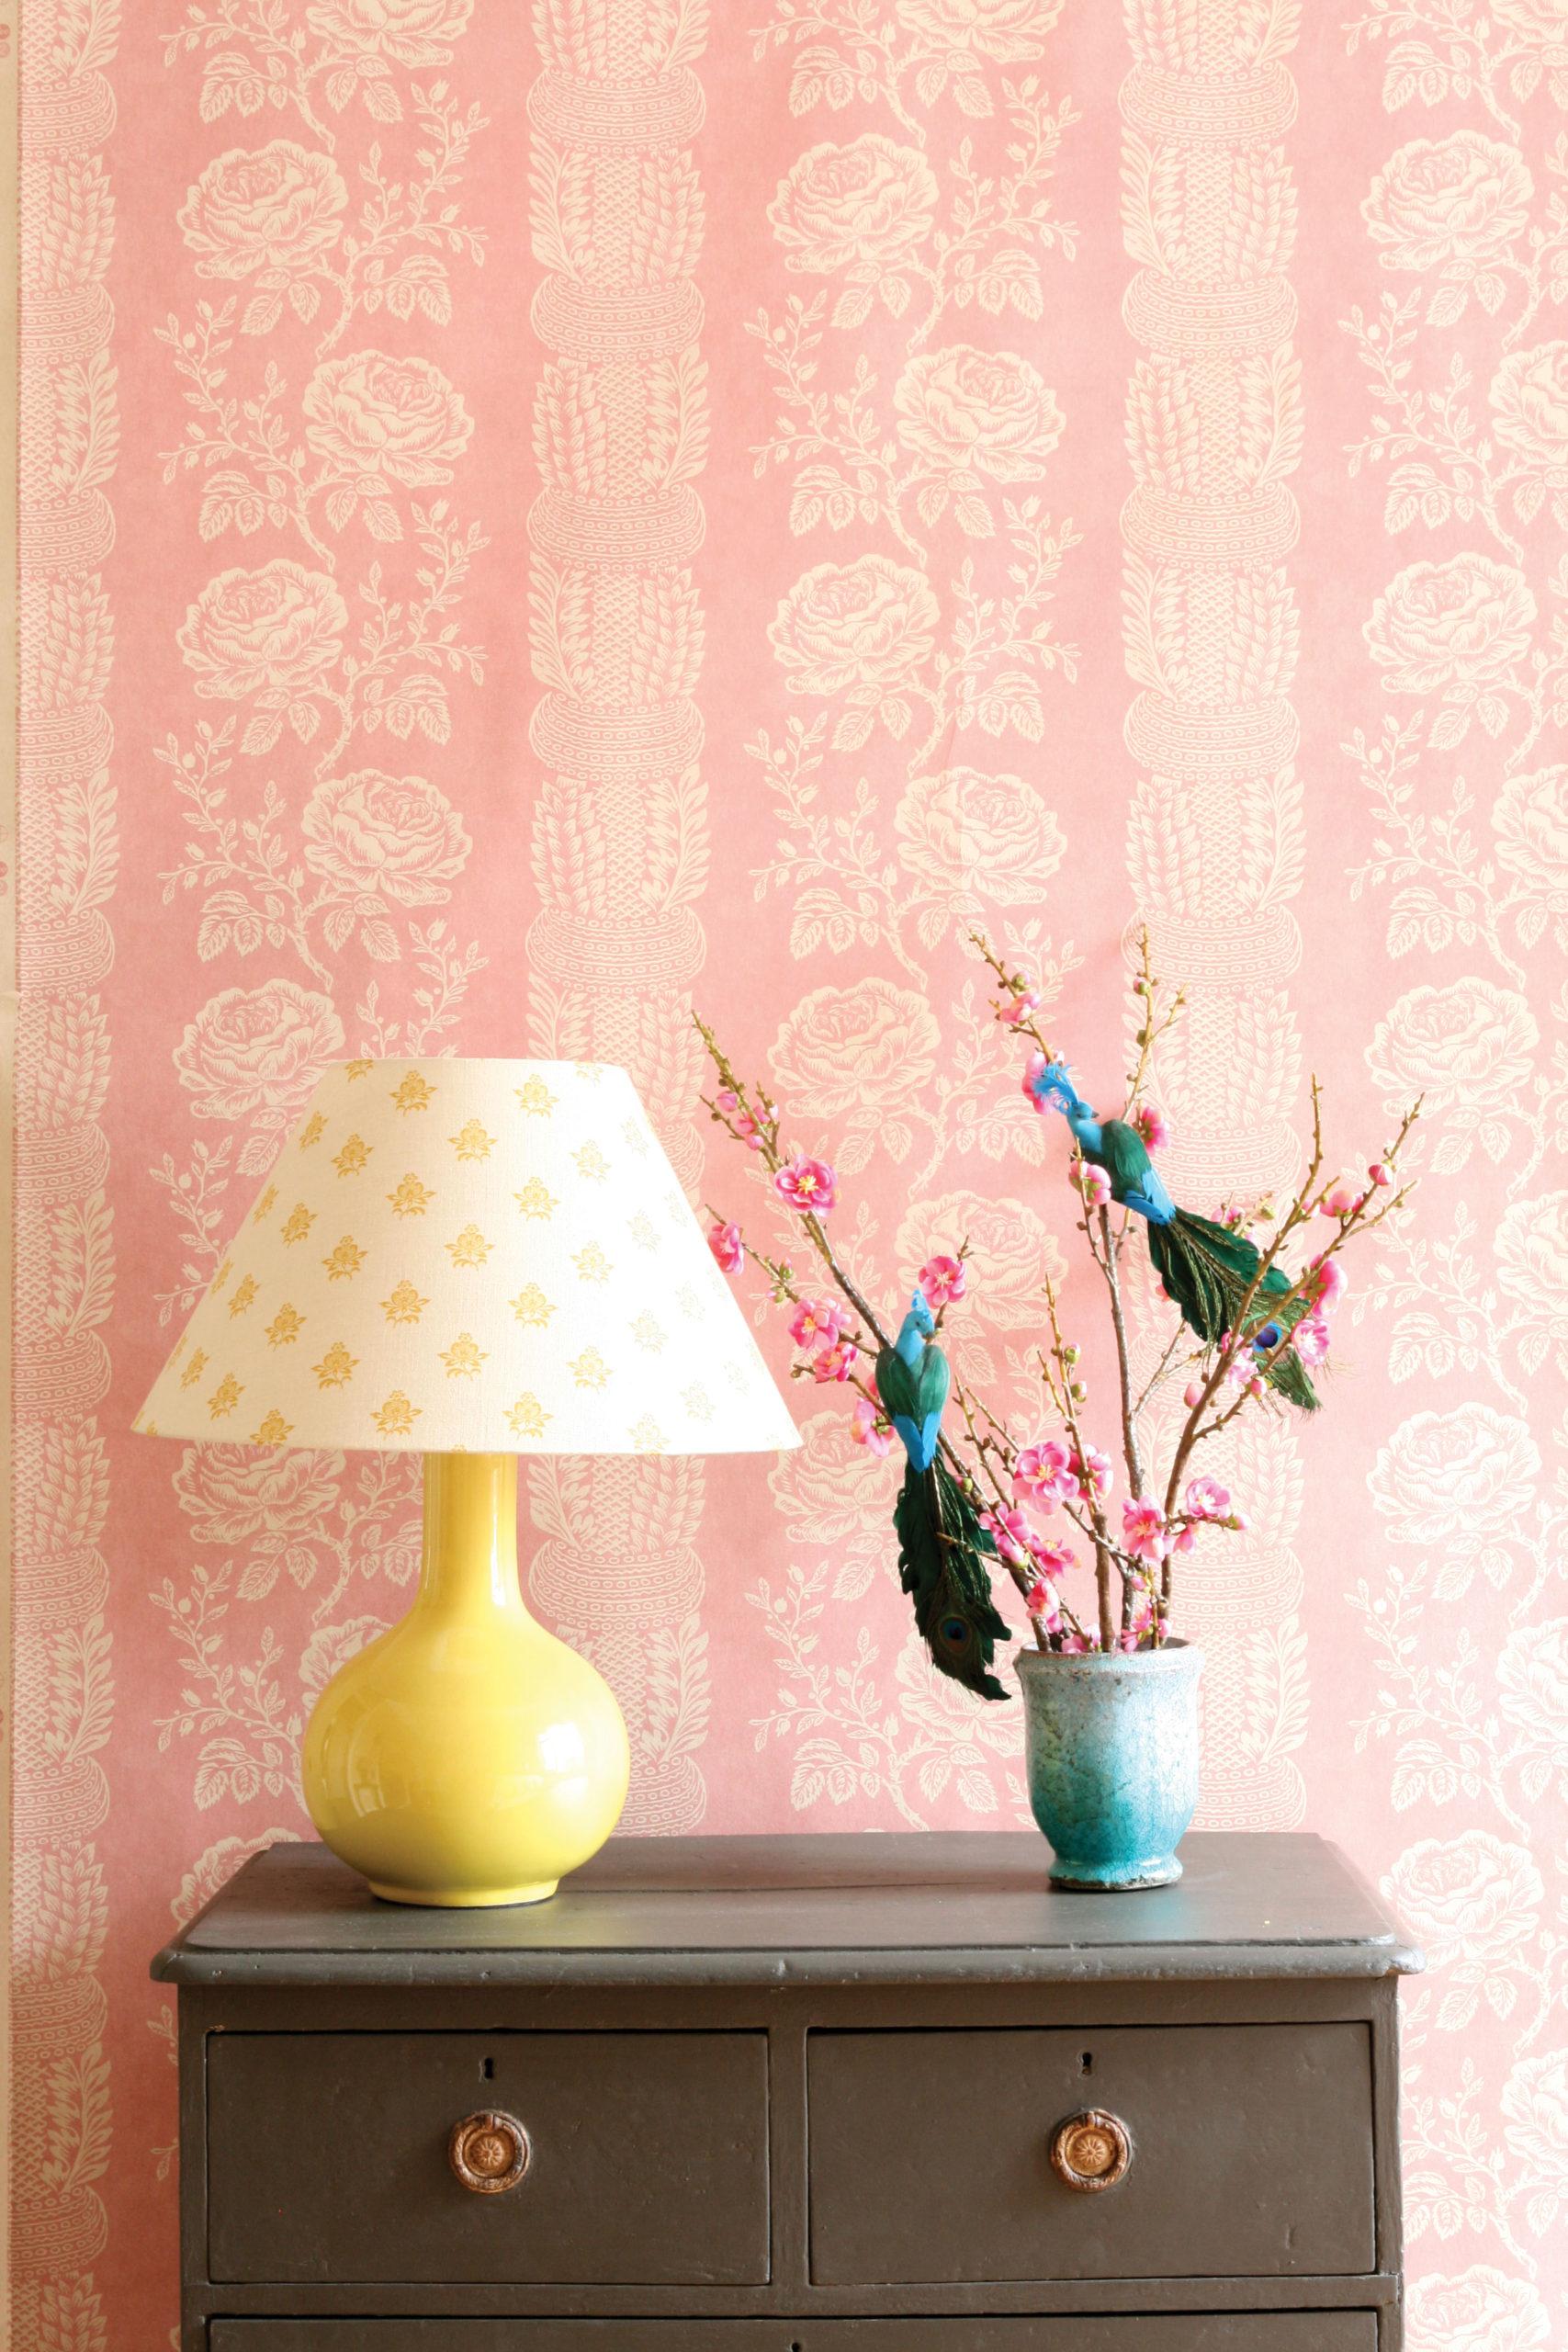 Delilah Wallpaper & Neisha Saffron Shade